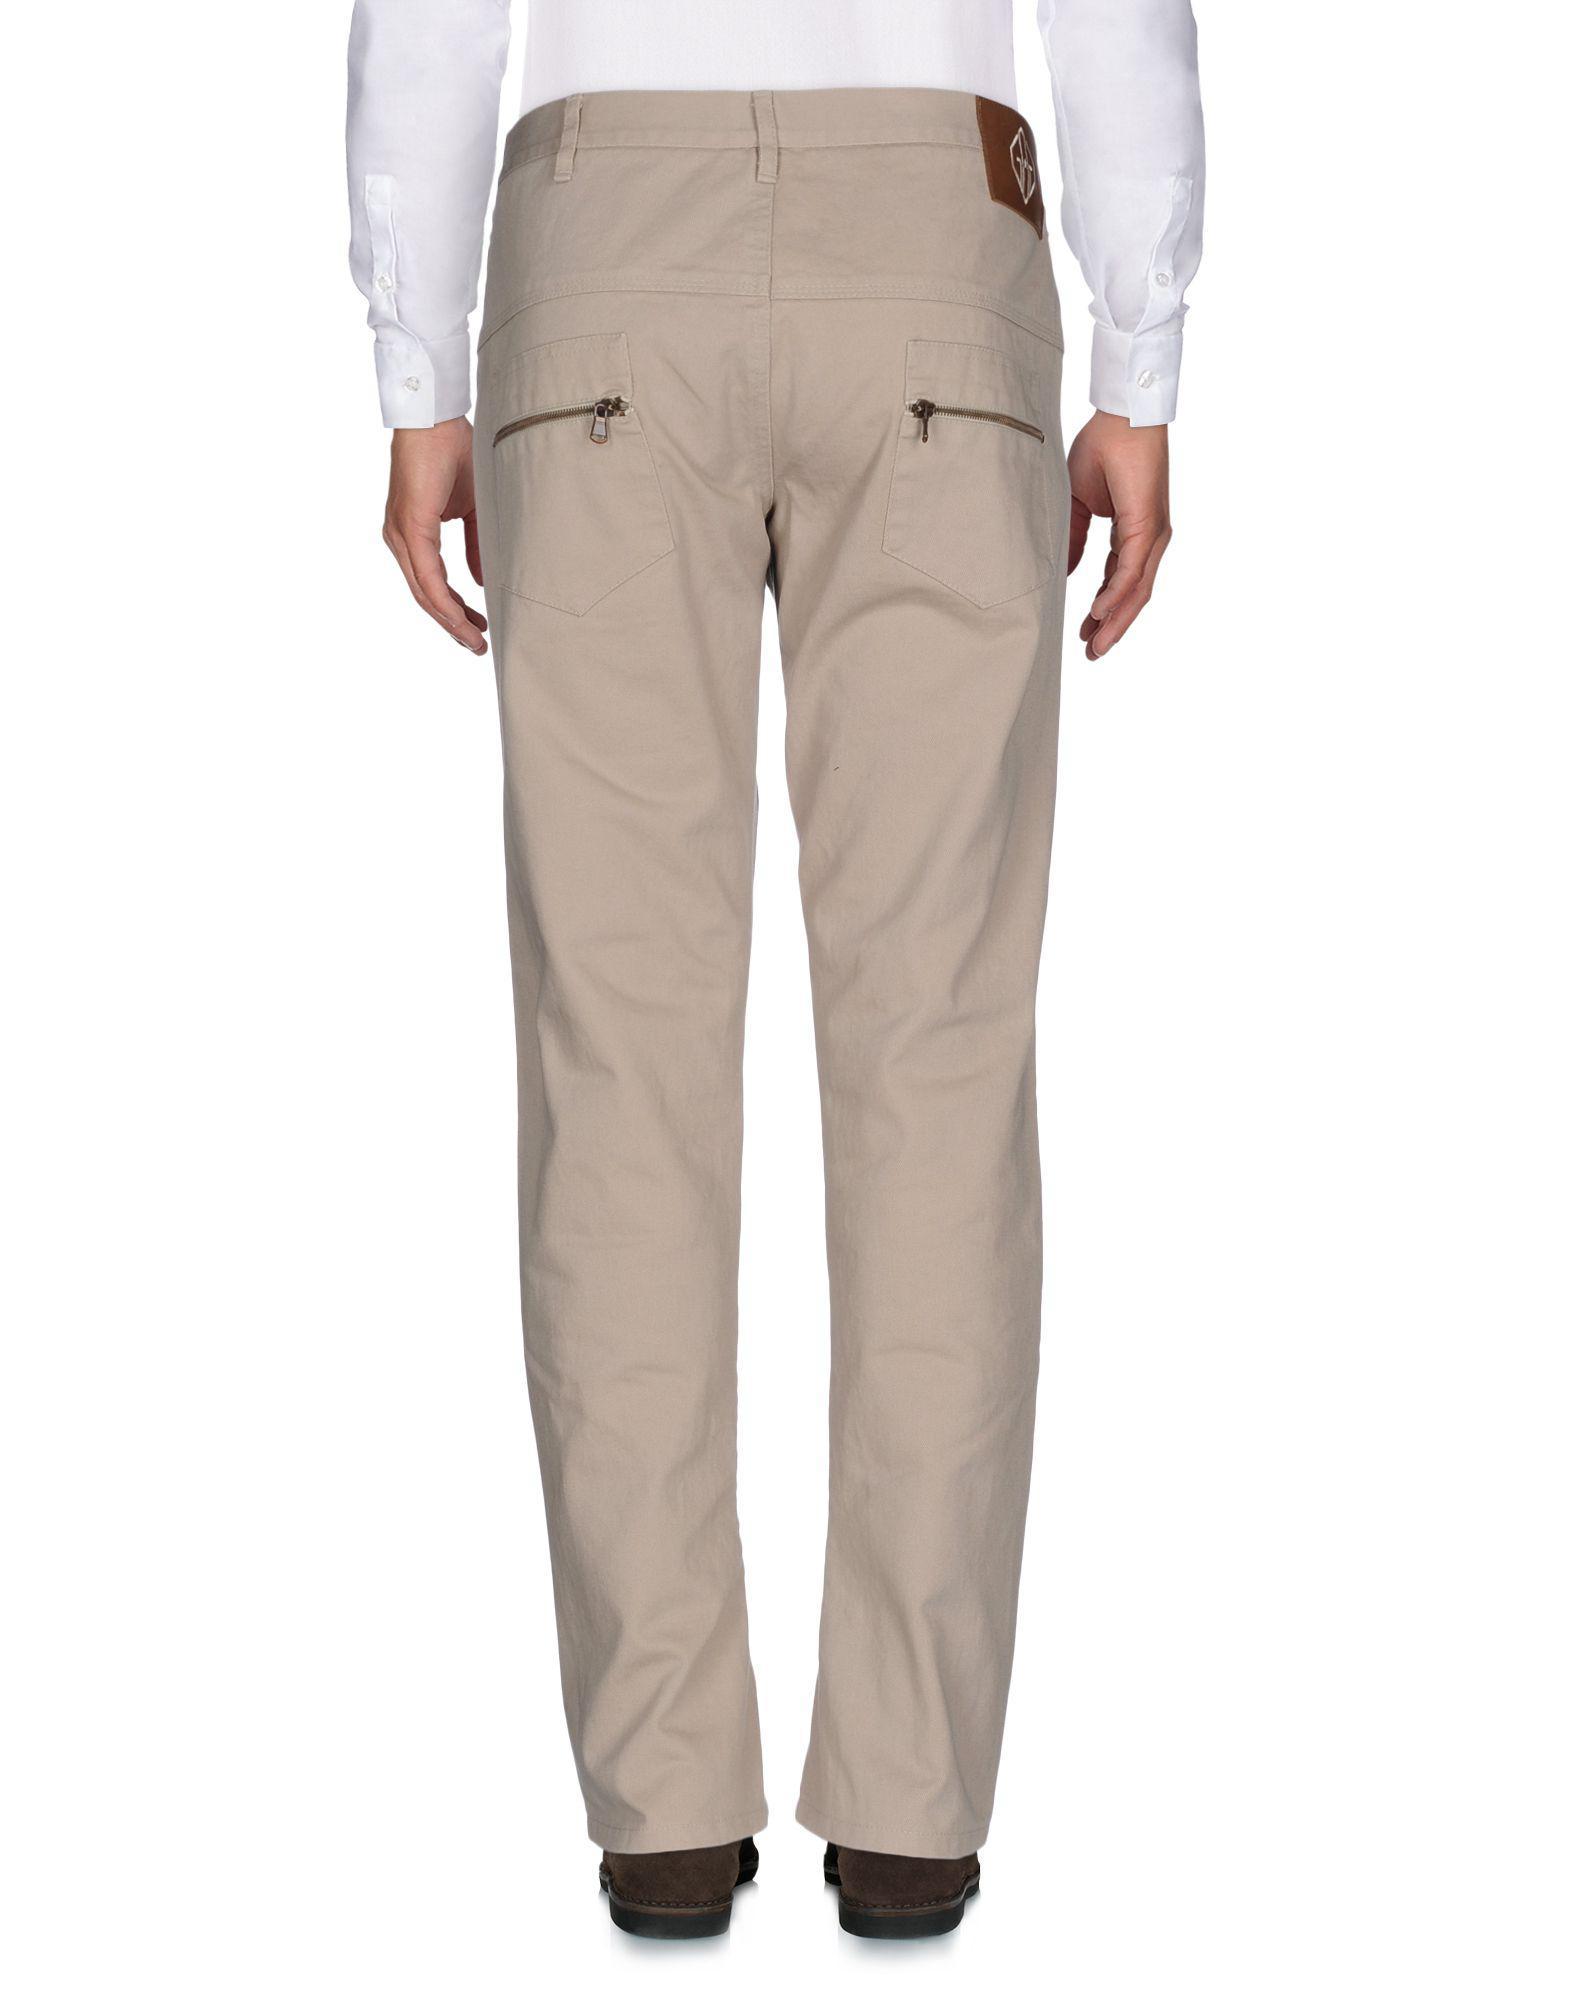 Golden Goose Deluxe Brand Cotton Casual Pants in Beige (Natural) for Men